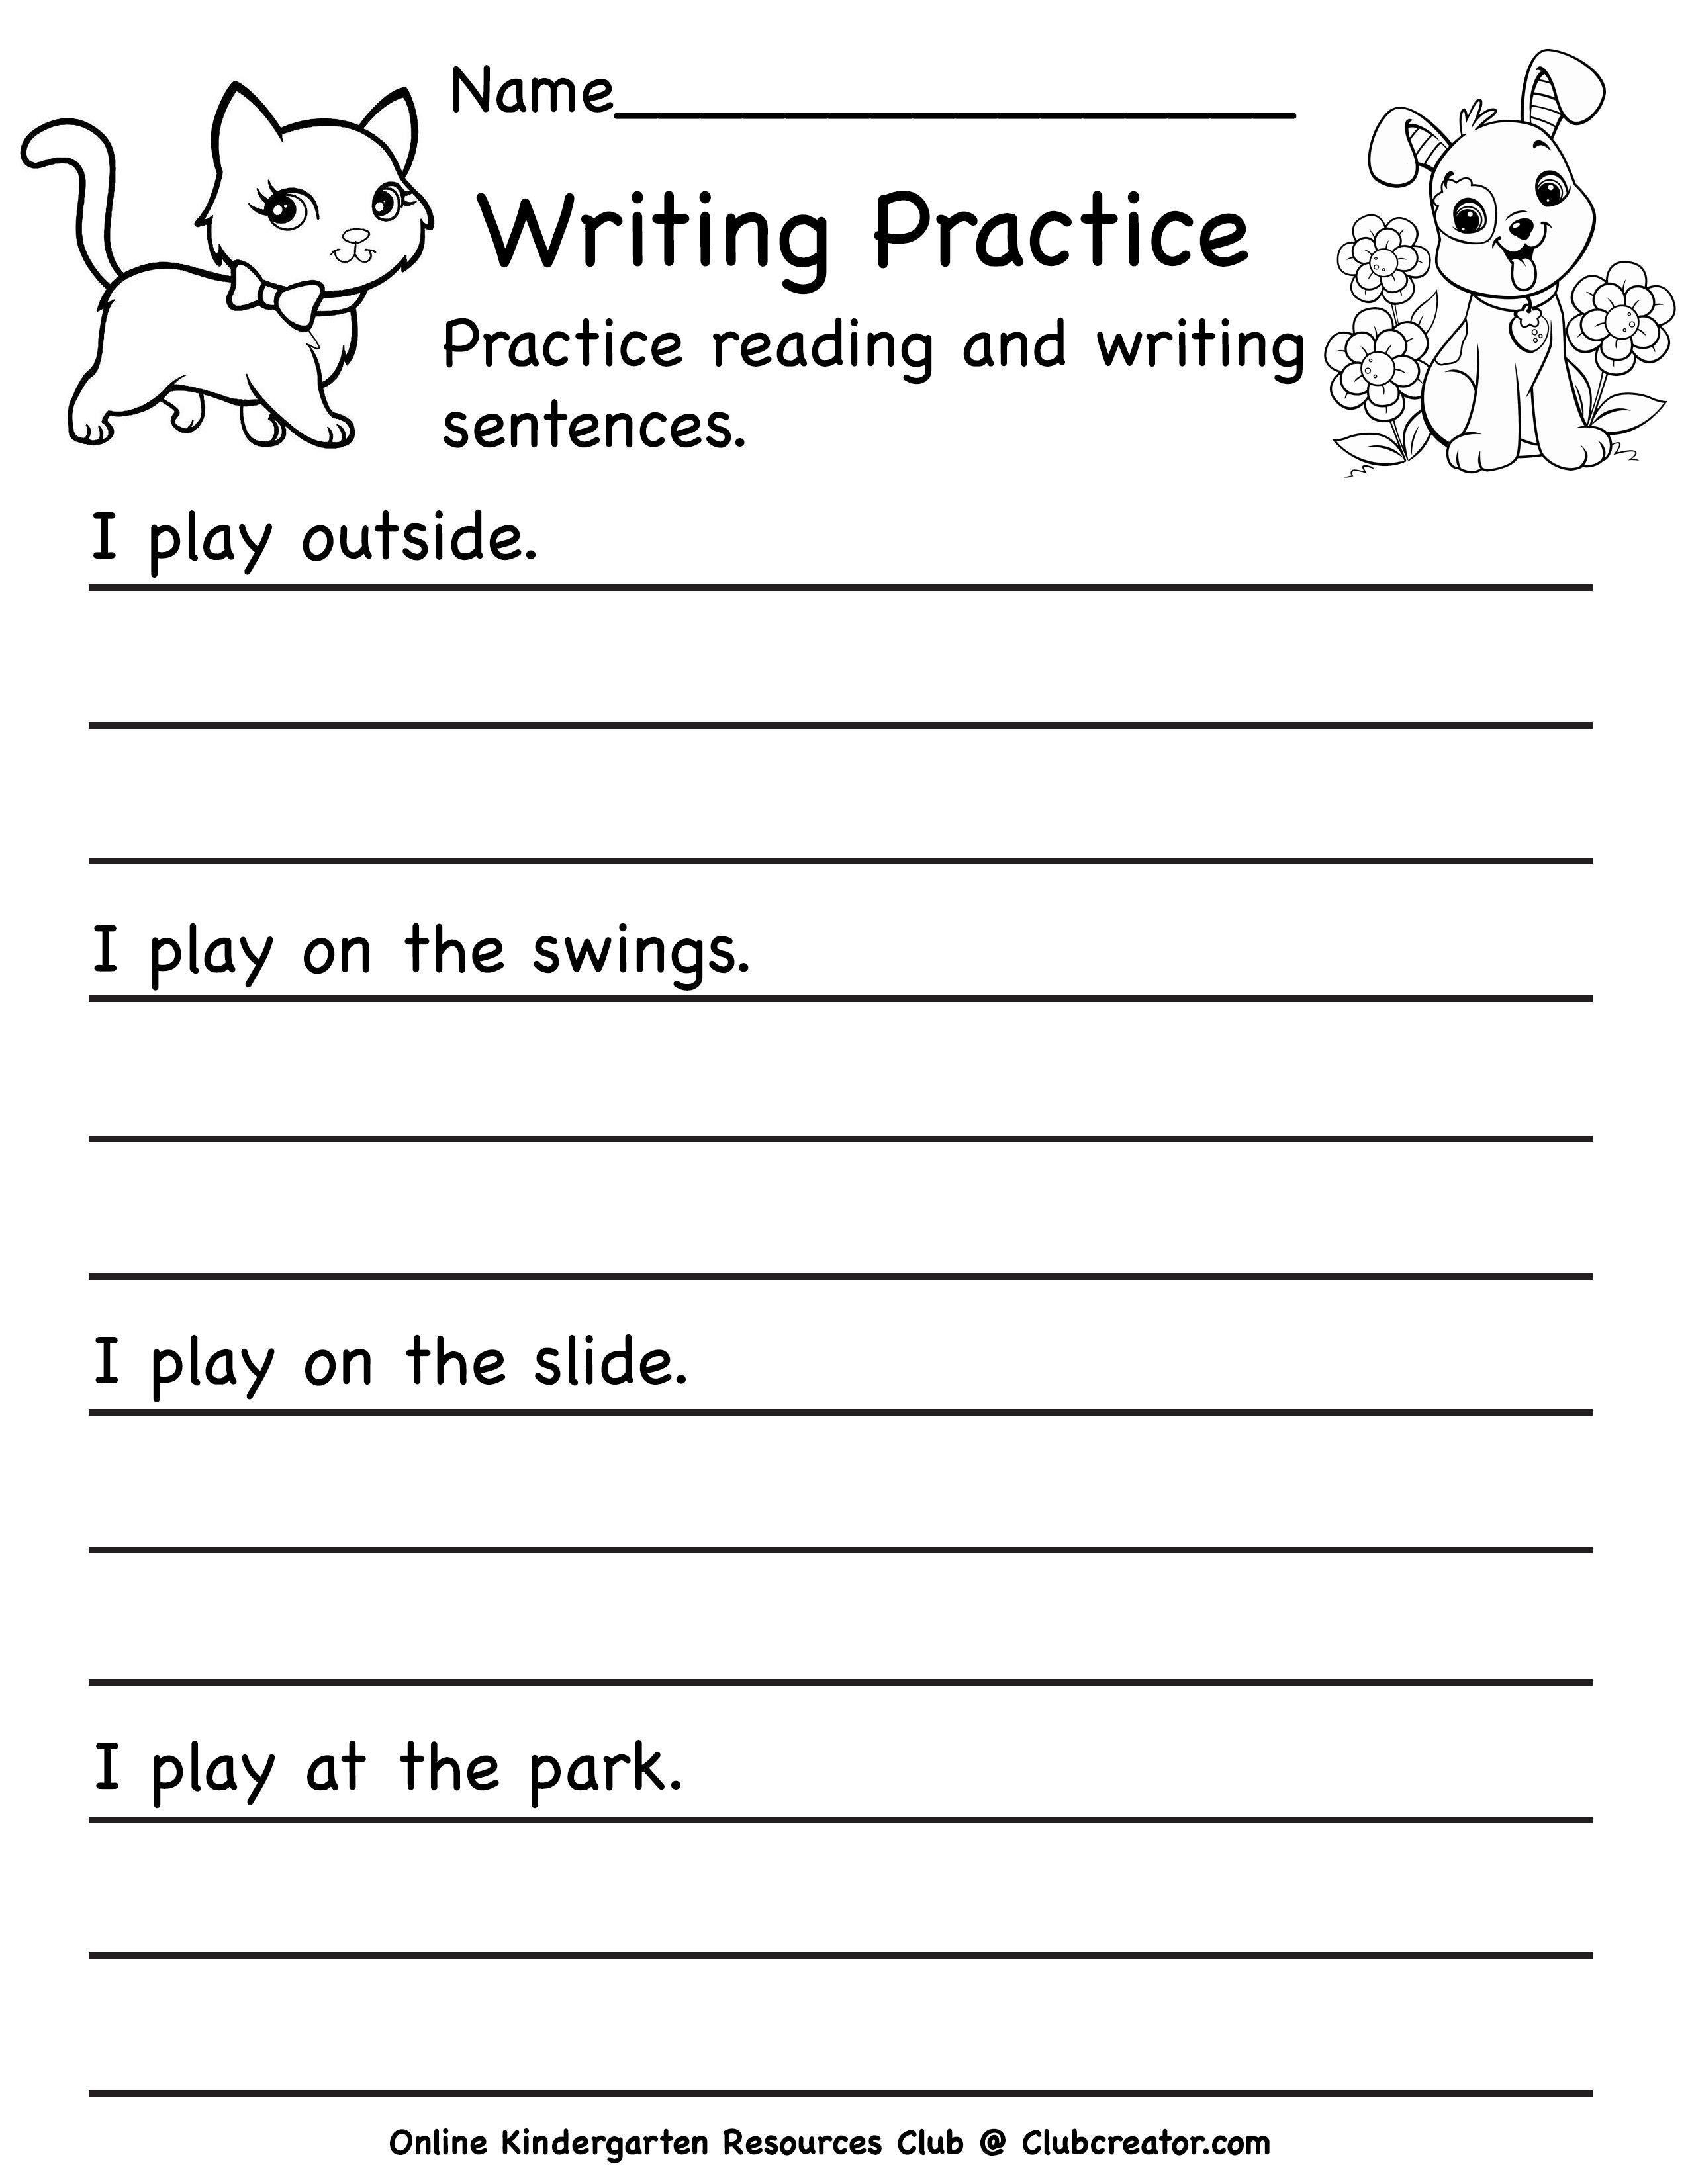 Writing Worksheet Writing Practice Worksheets Writing Practice Sentence Writing [ 3300 x 2550 Pixel ]